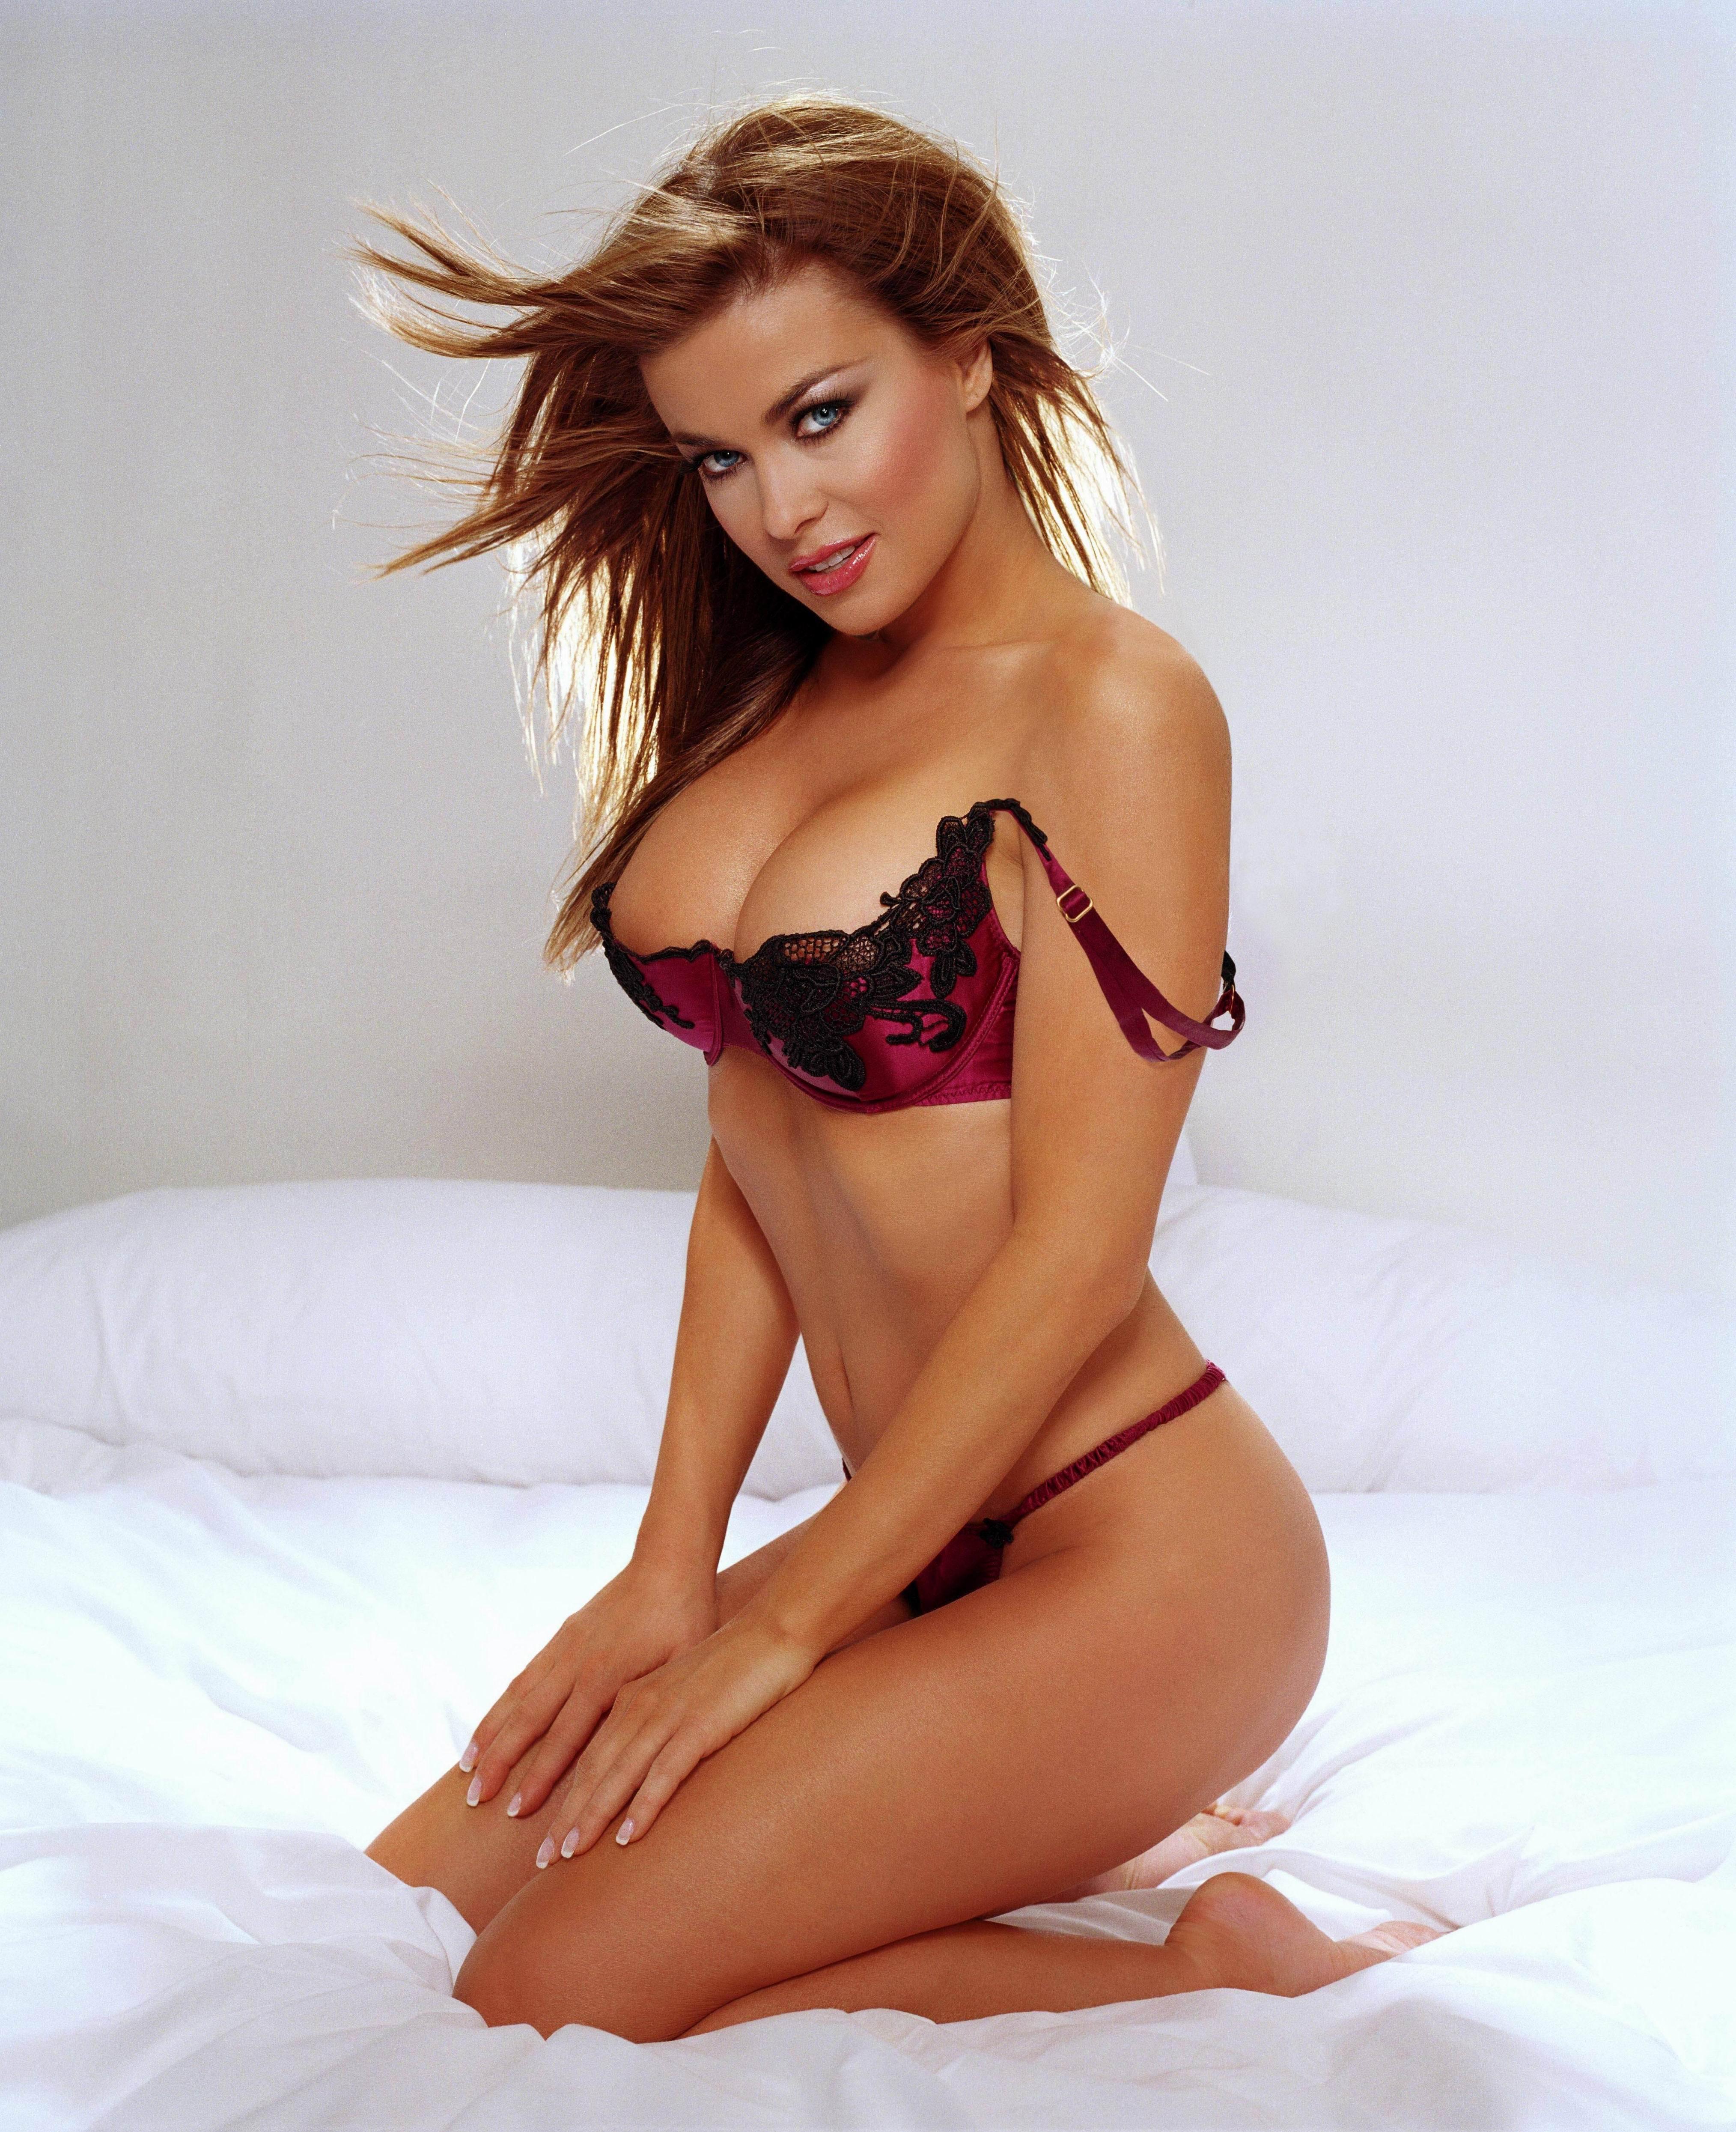 Bikini carmen electra foto